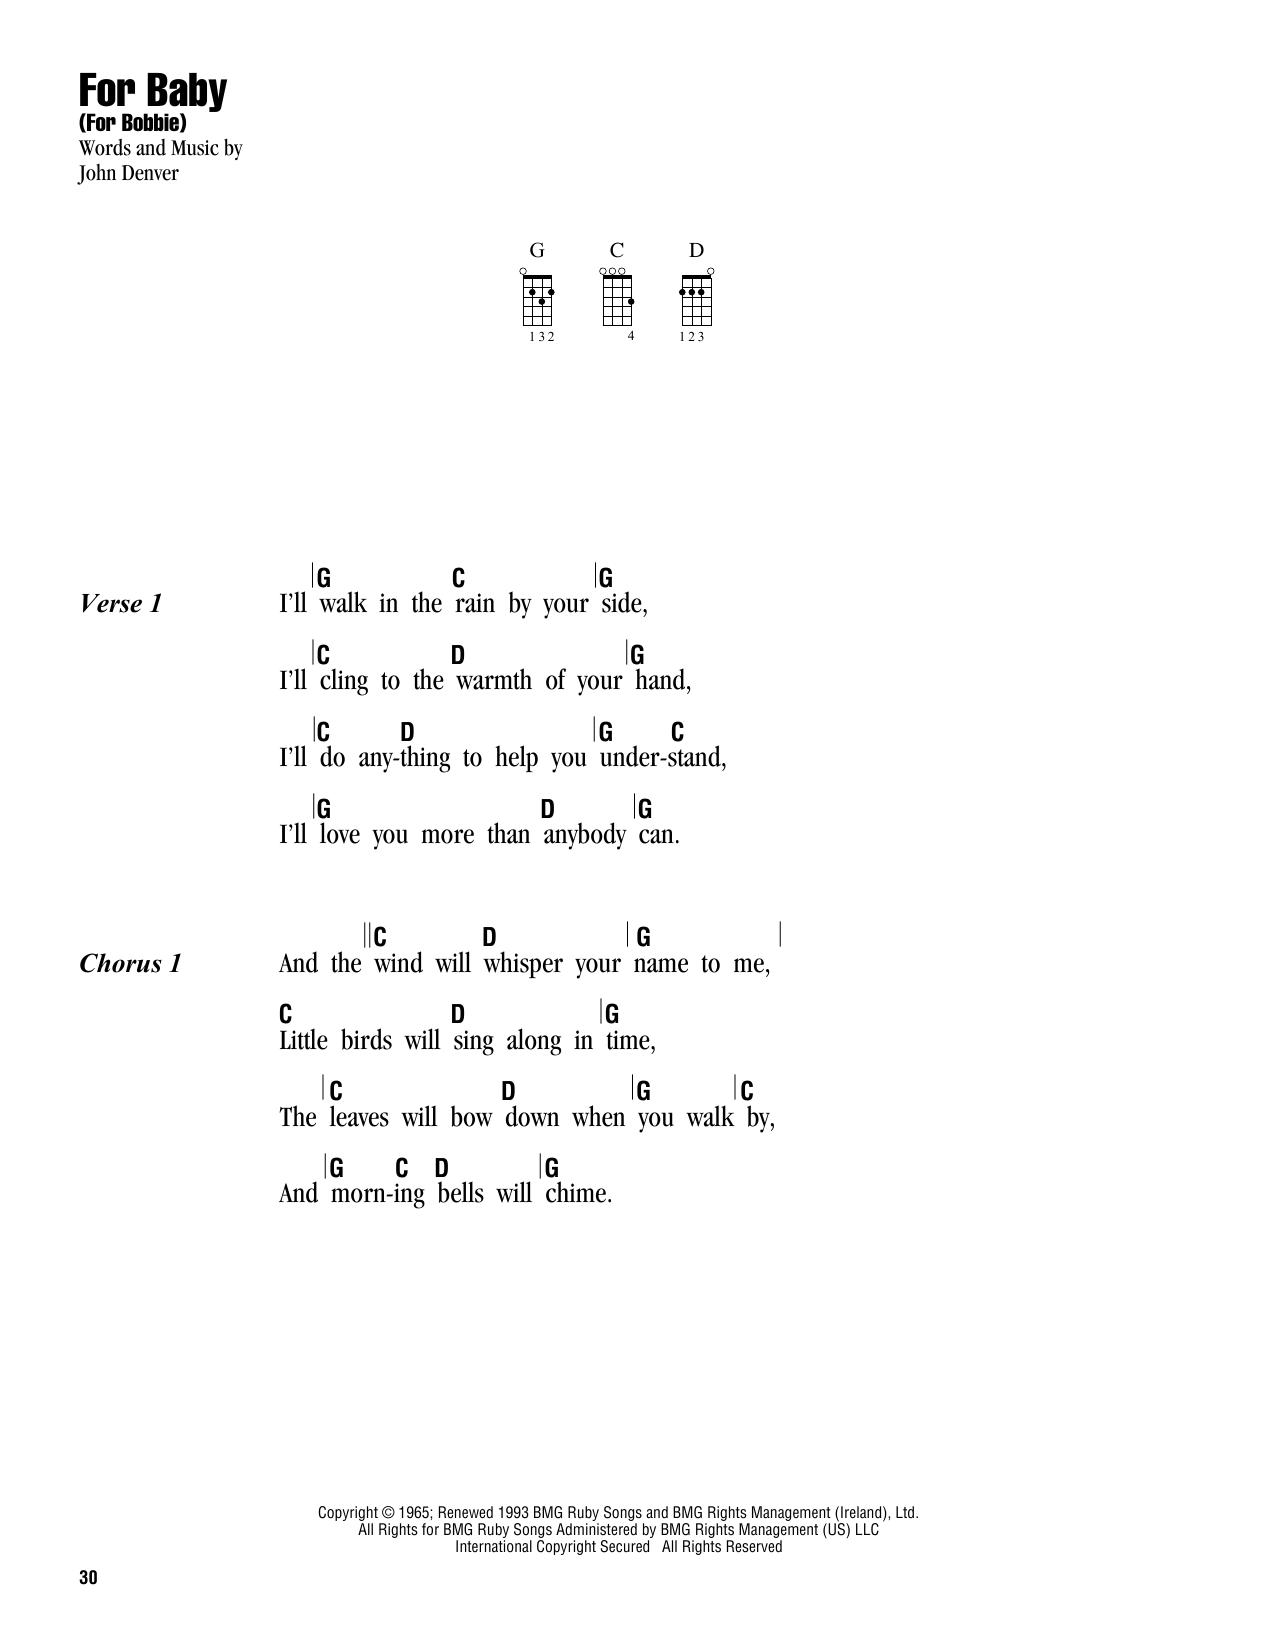 John denver grandma s feather bed sheet music - Sheet Music Digital By Merriam Music